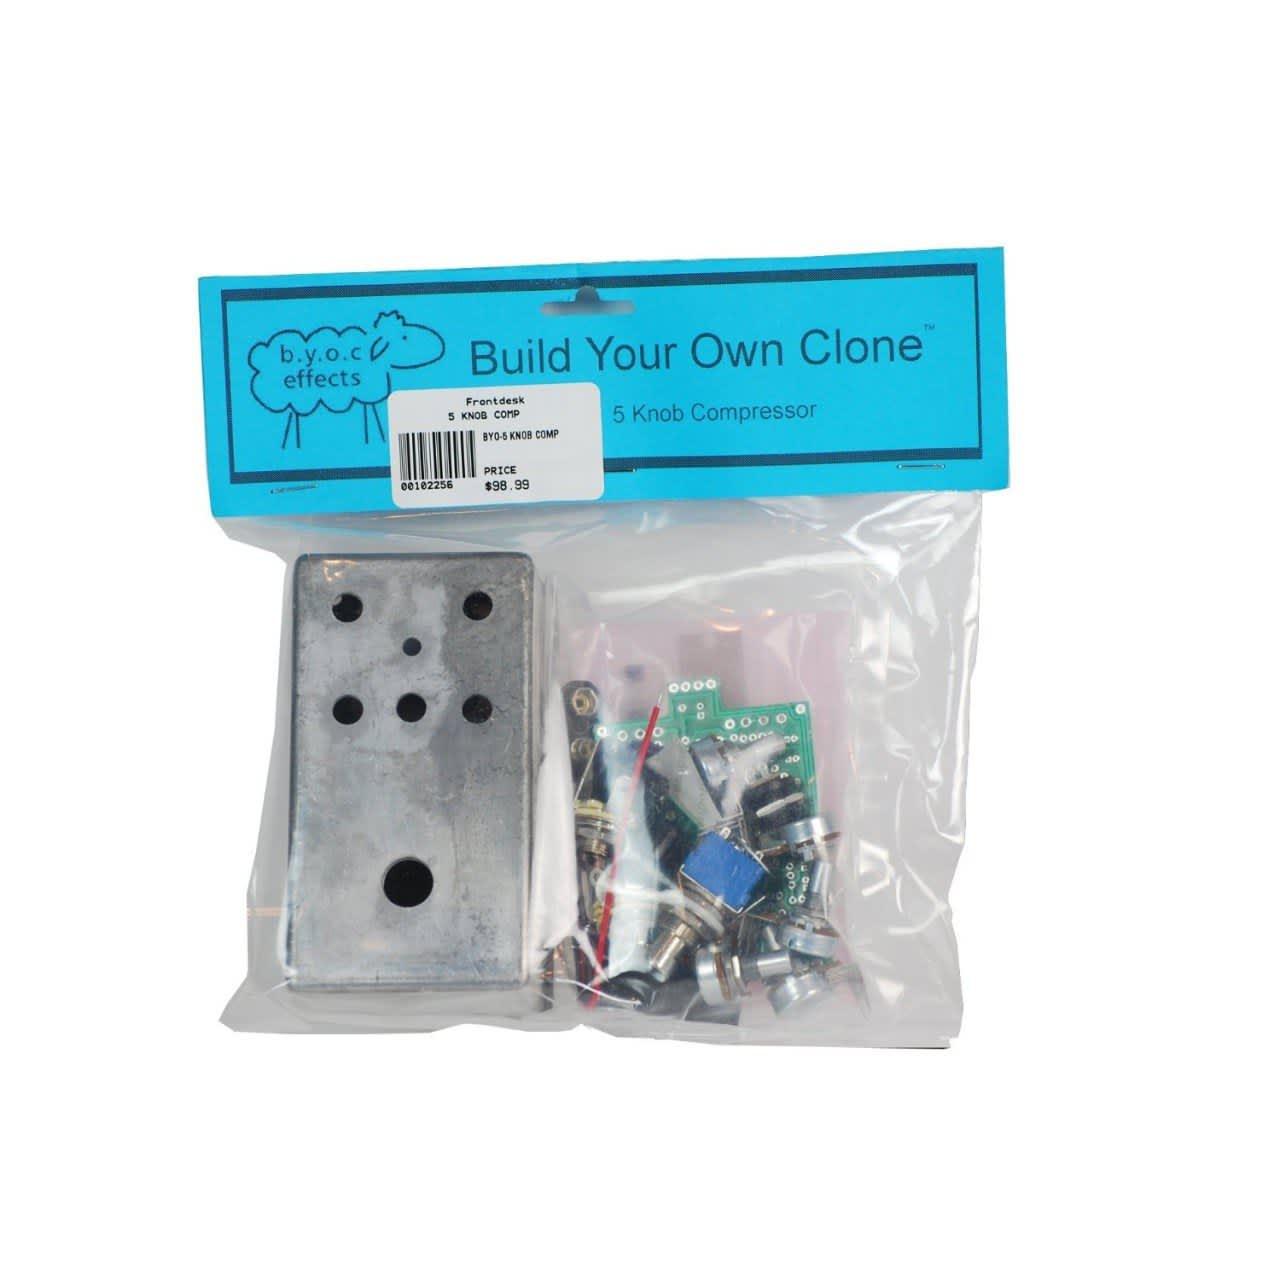 Build Your Own Clone  Knob Compressor